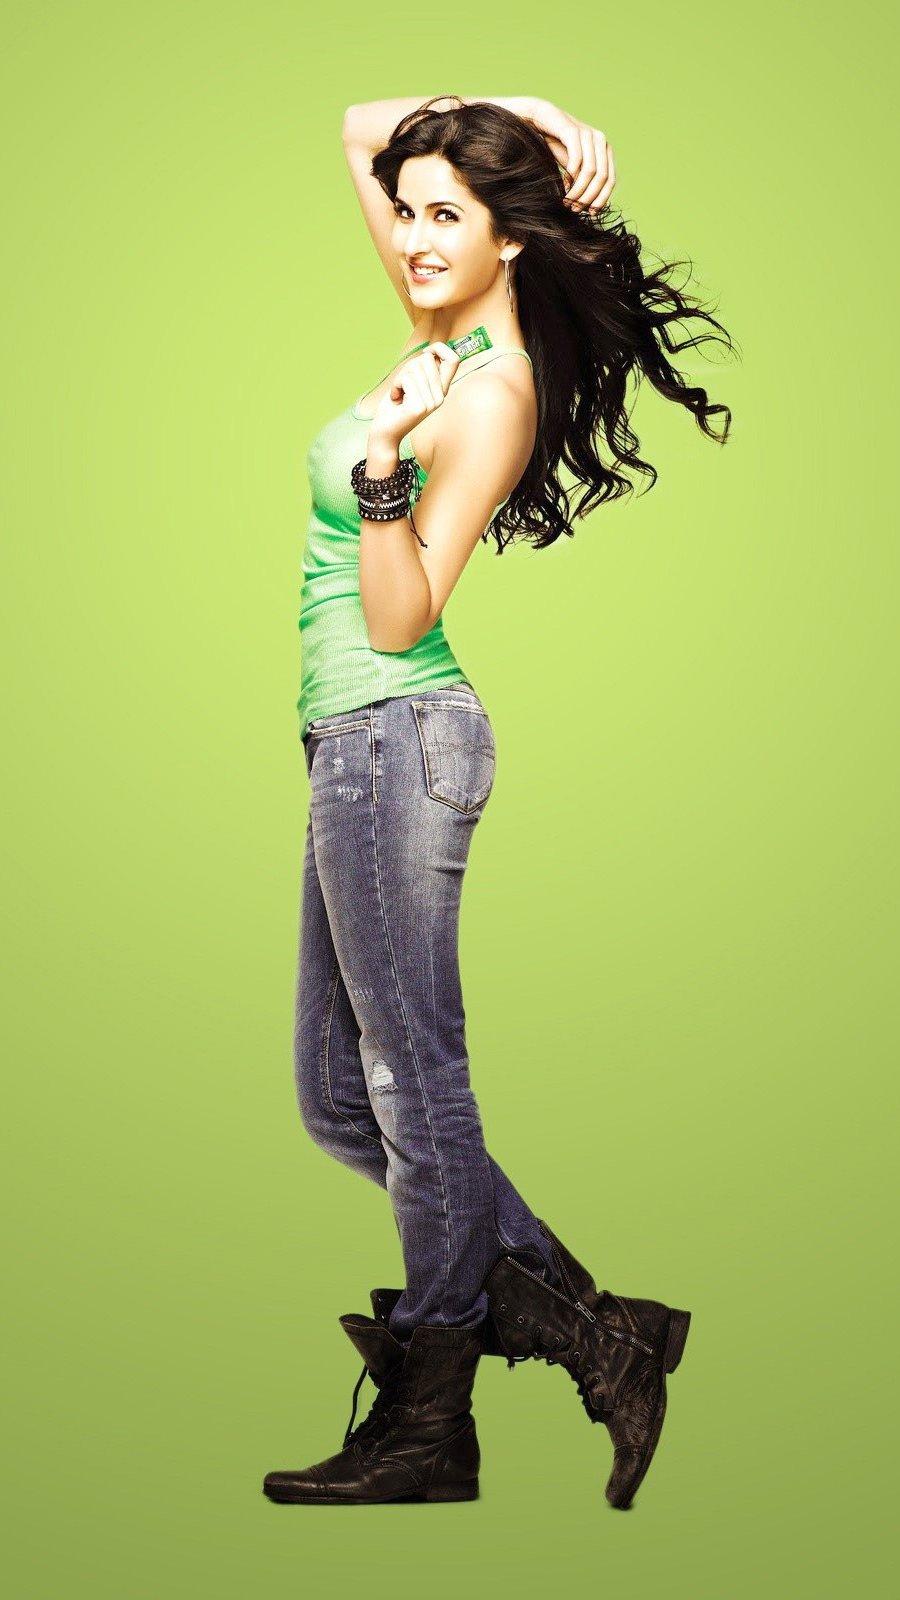 Wallpaper Bollywood actress Katrina Kaif Vertical